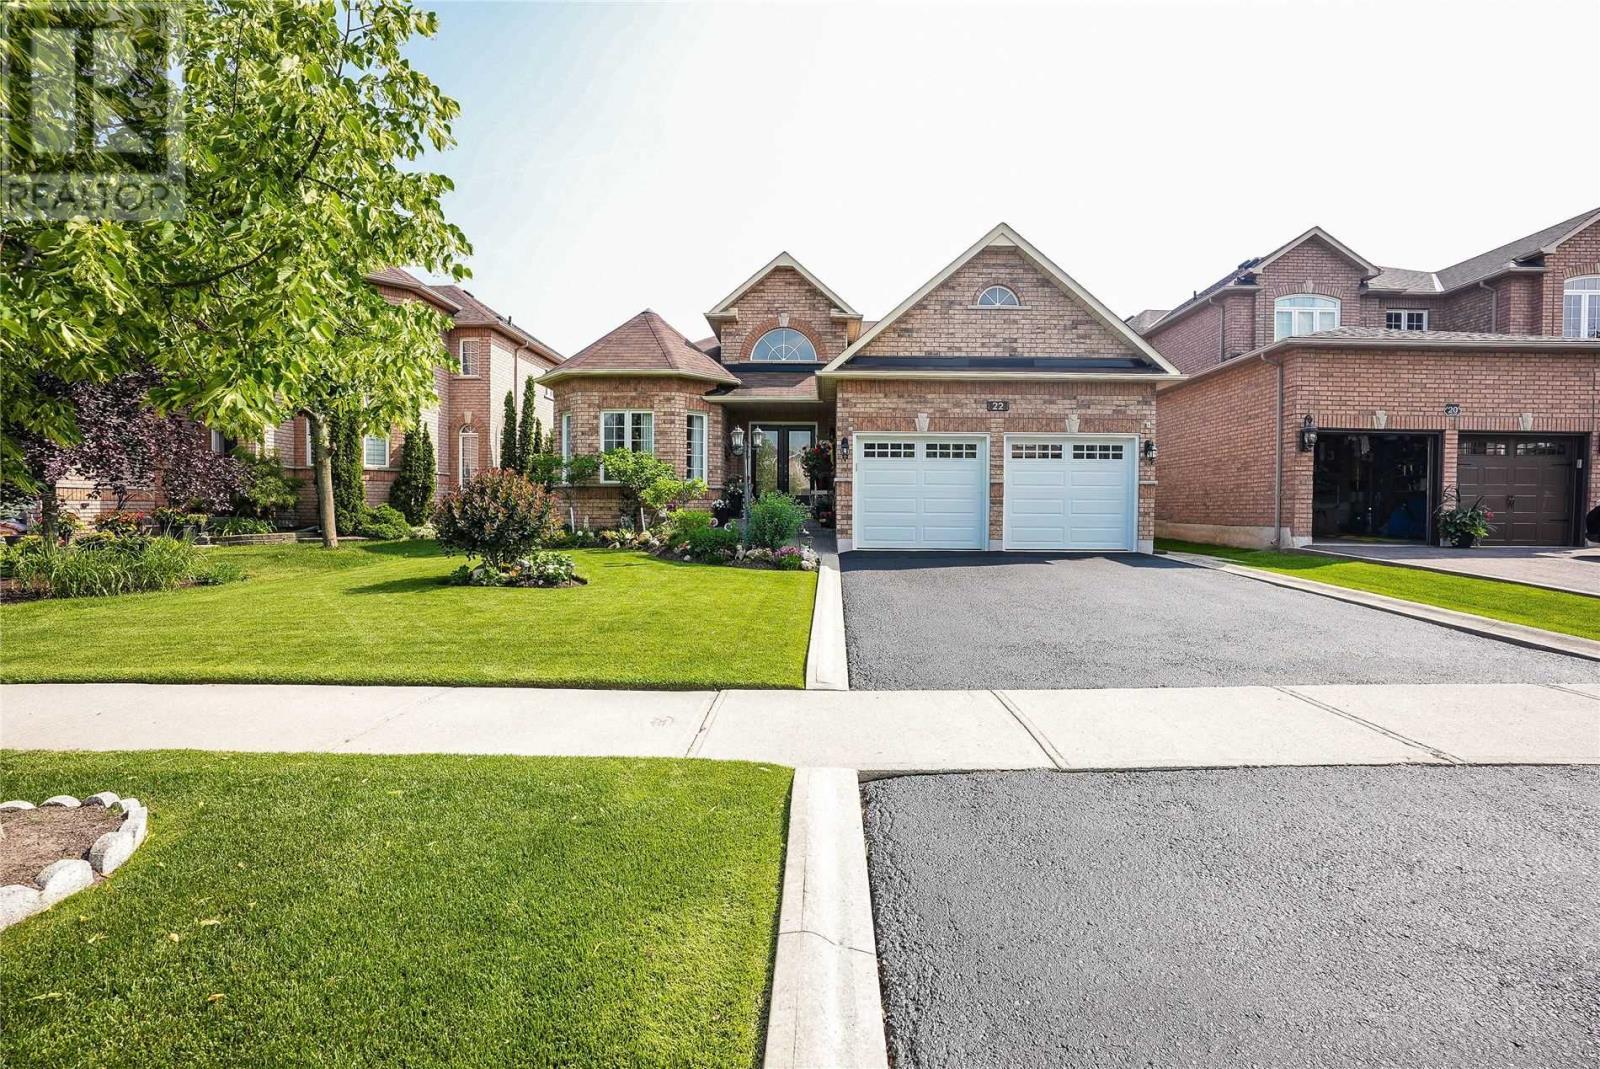 22 Robinson Rd, Halton Hills, Ontario  L7G 6G5 - Photo 3 - W5287864